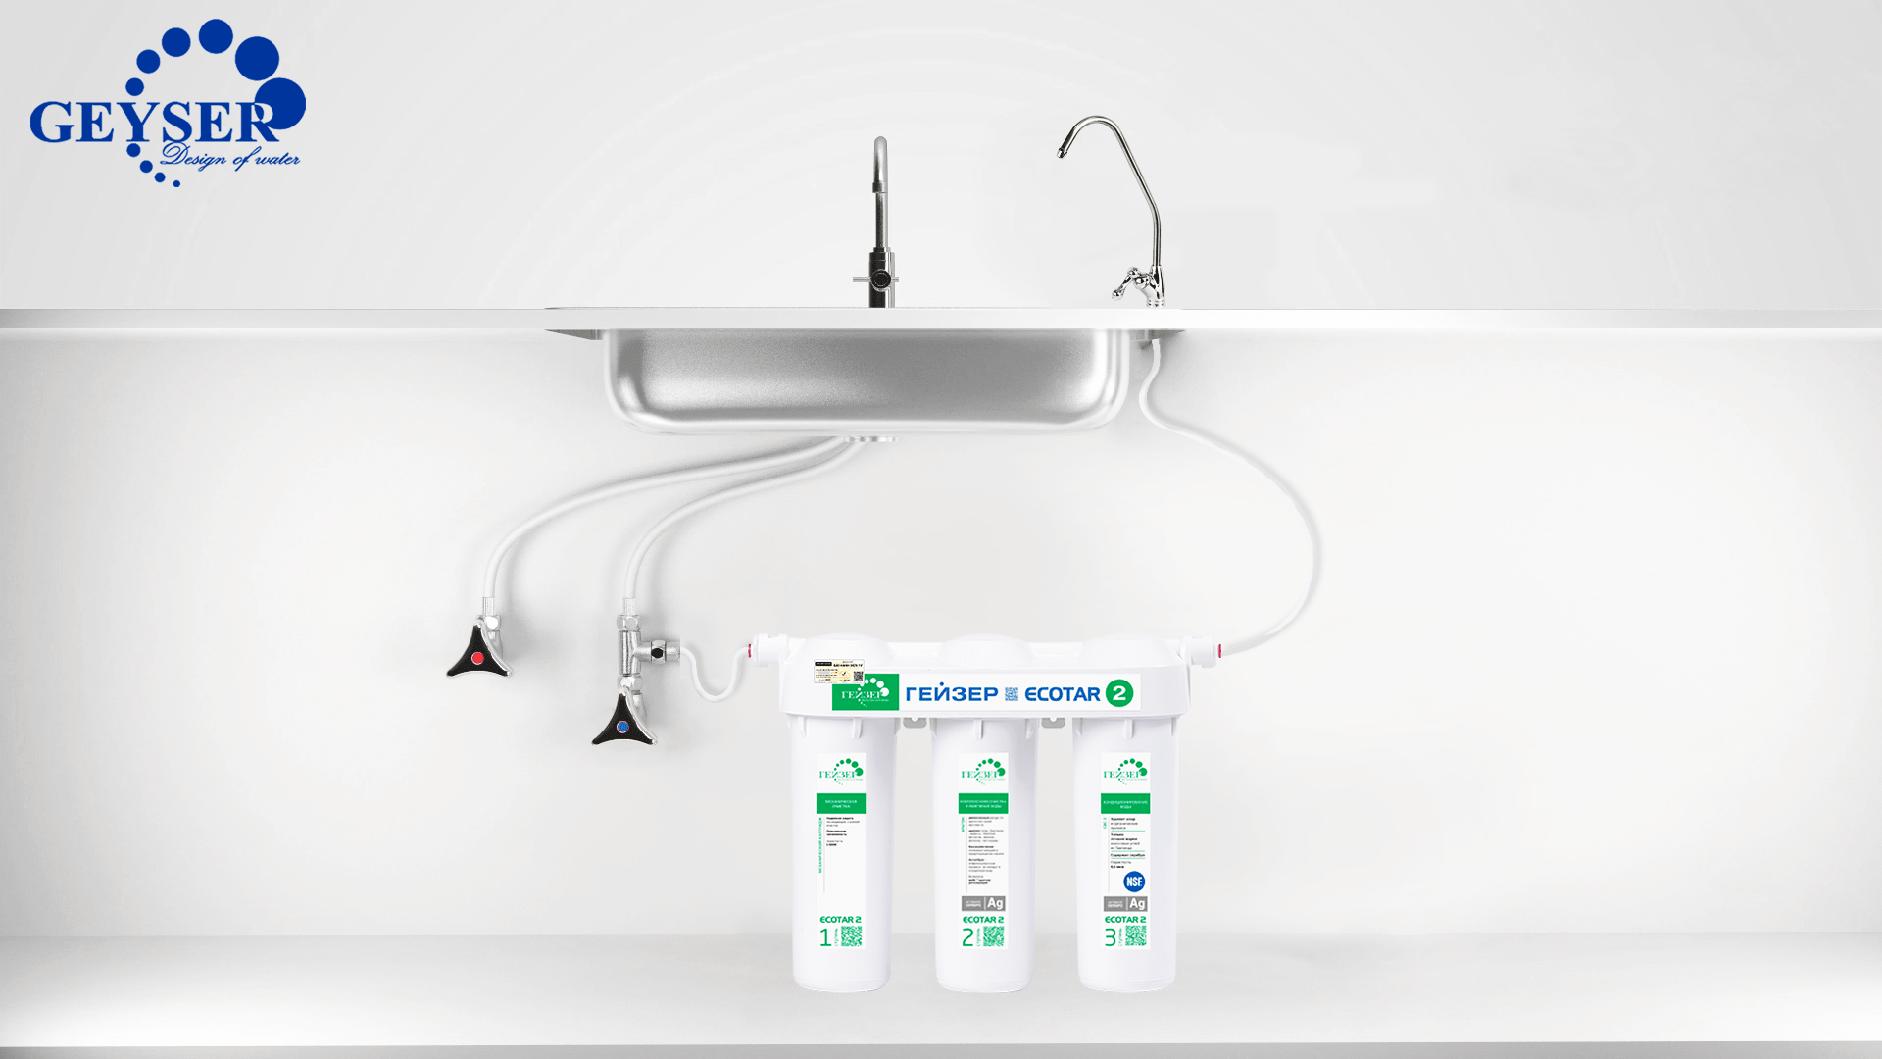 Geyser Ecotar 2 dễ dàng lắp đặt